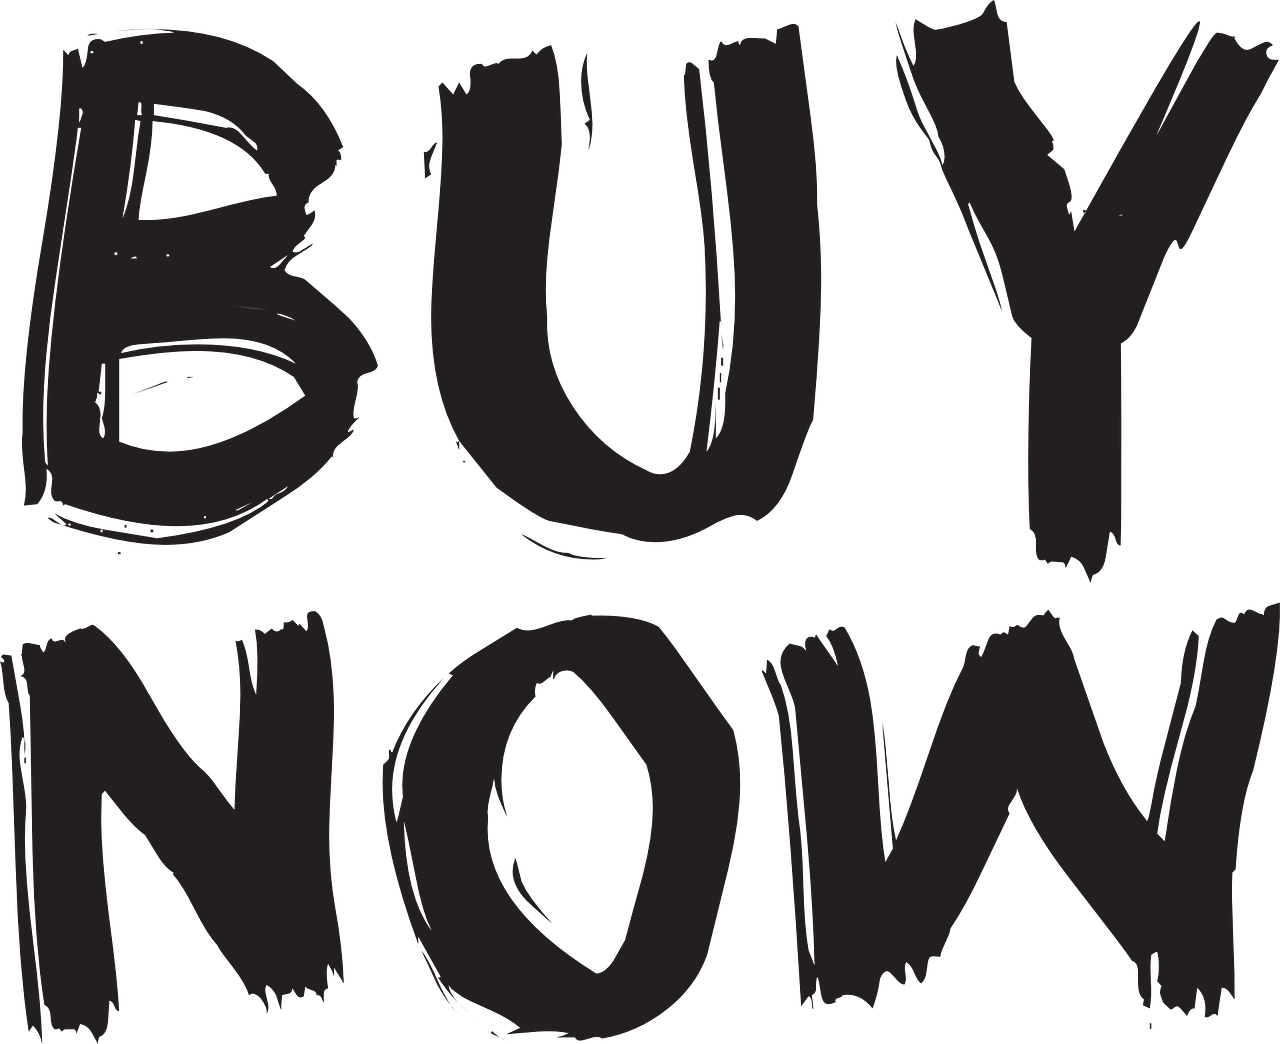 buy-now-606685_1280